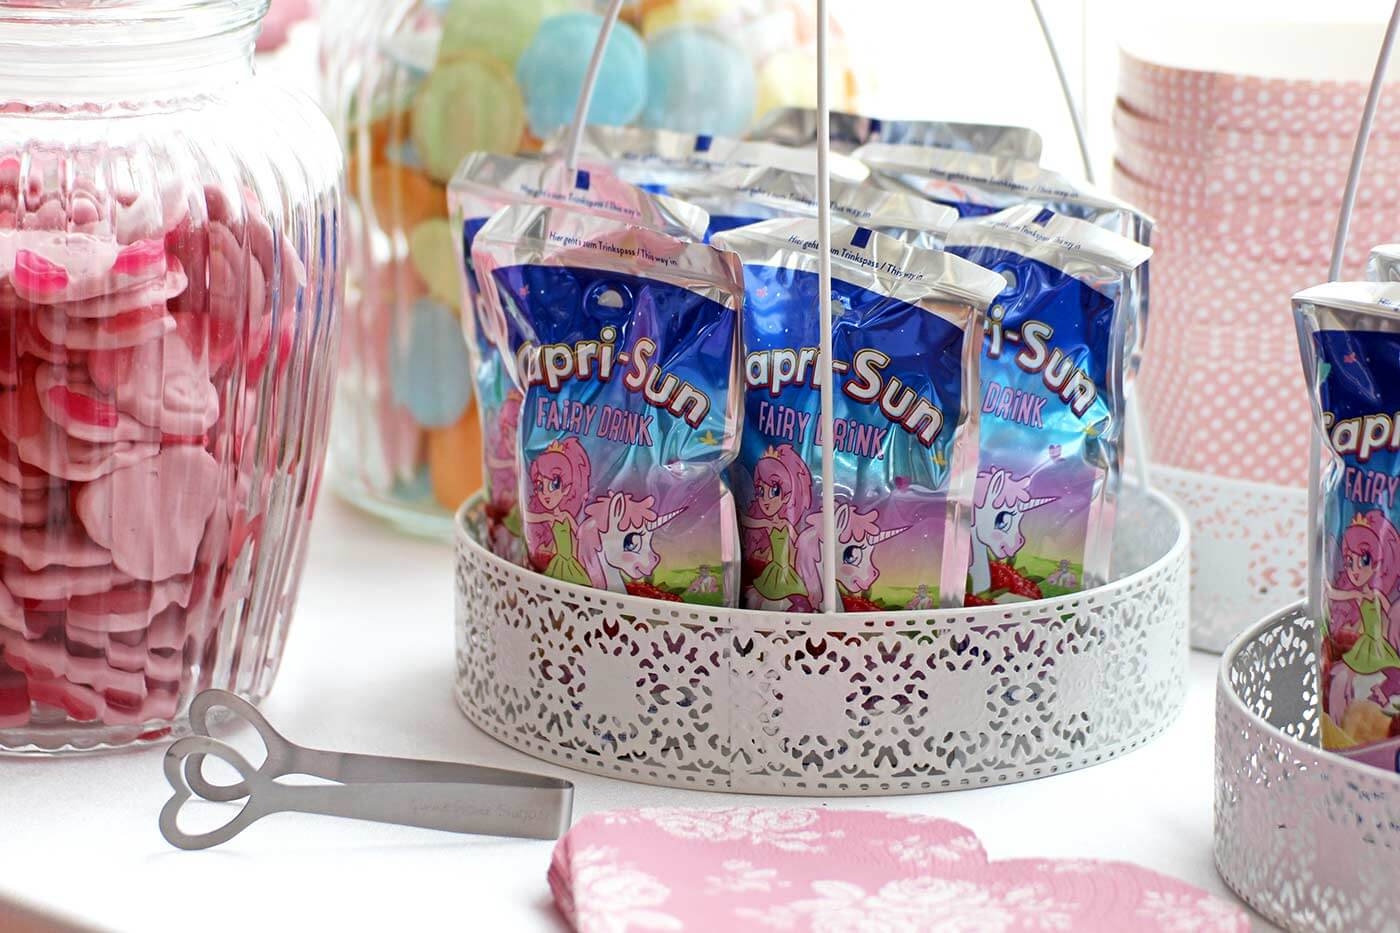 Süßes für Candybar